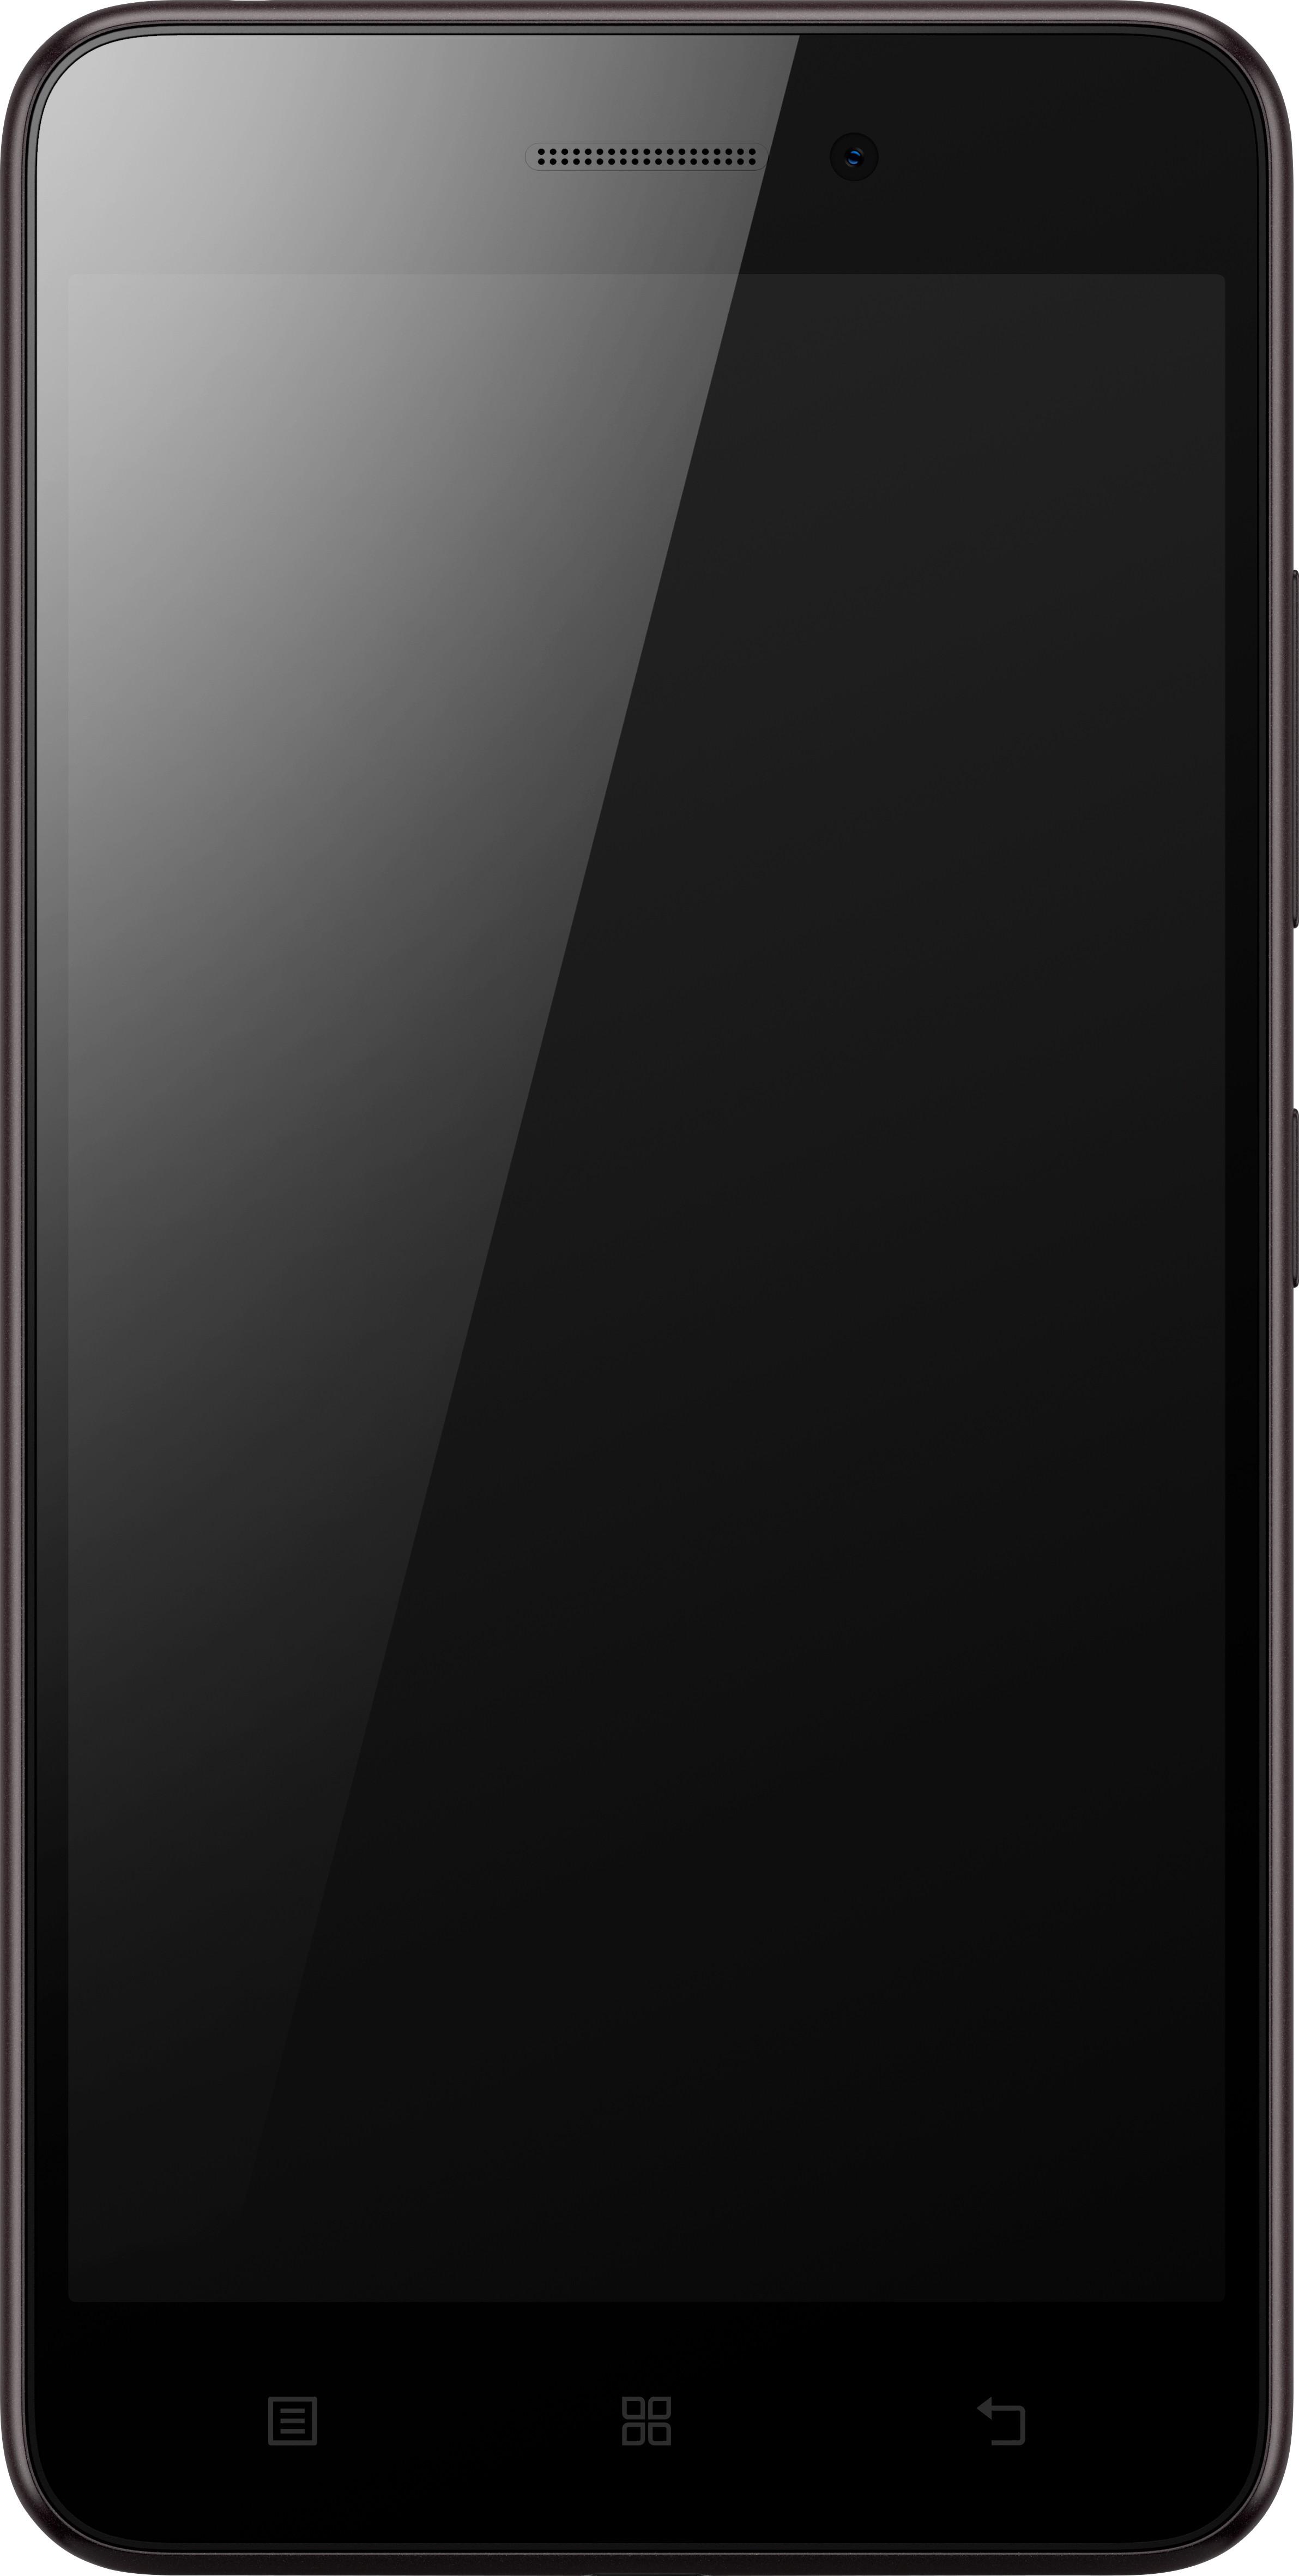 Lenovo Sisley S60 (Graphite Grey, 8 GB)(2 GB RAM)